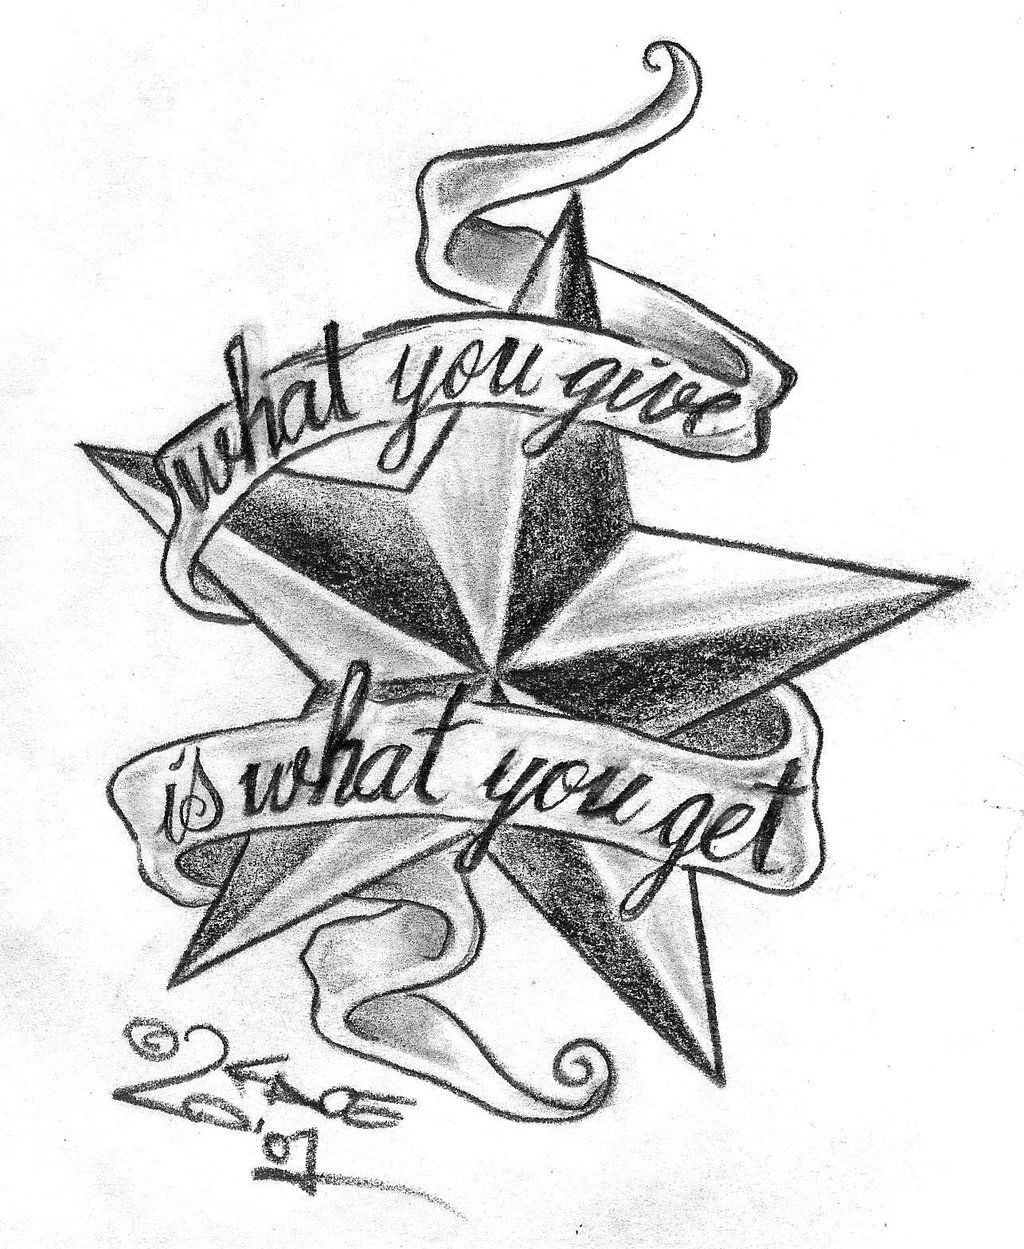 Sign tattoo designs - Audio Heart Tattoo Design By Pointofyou On Deviantart